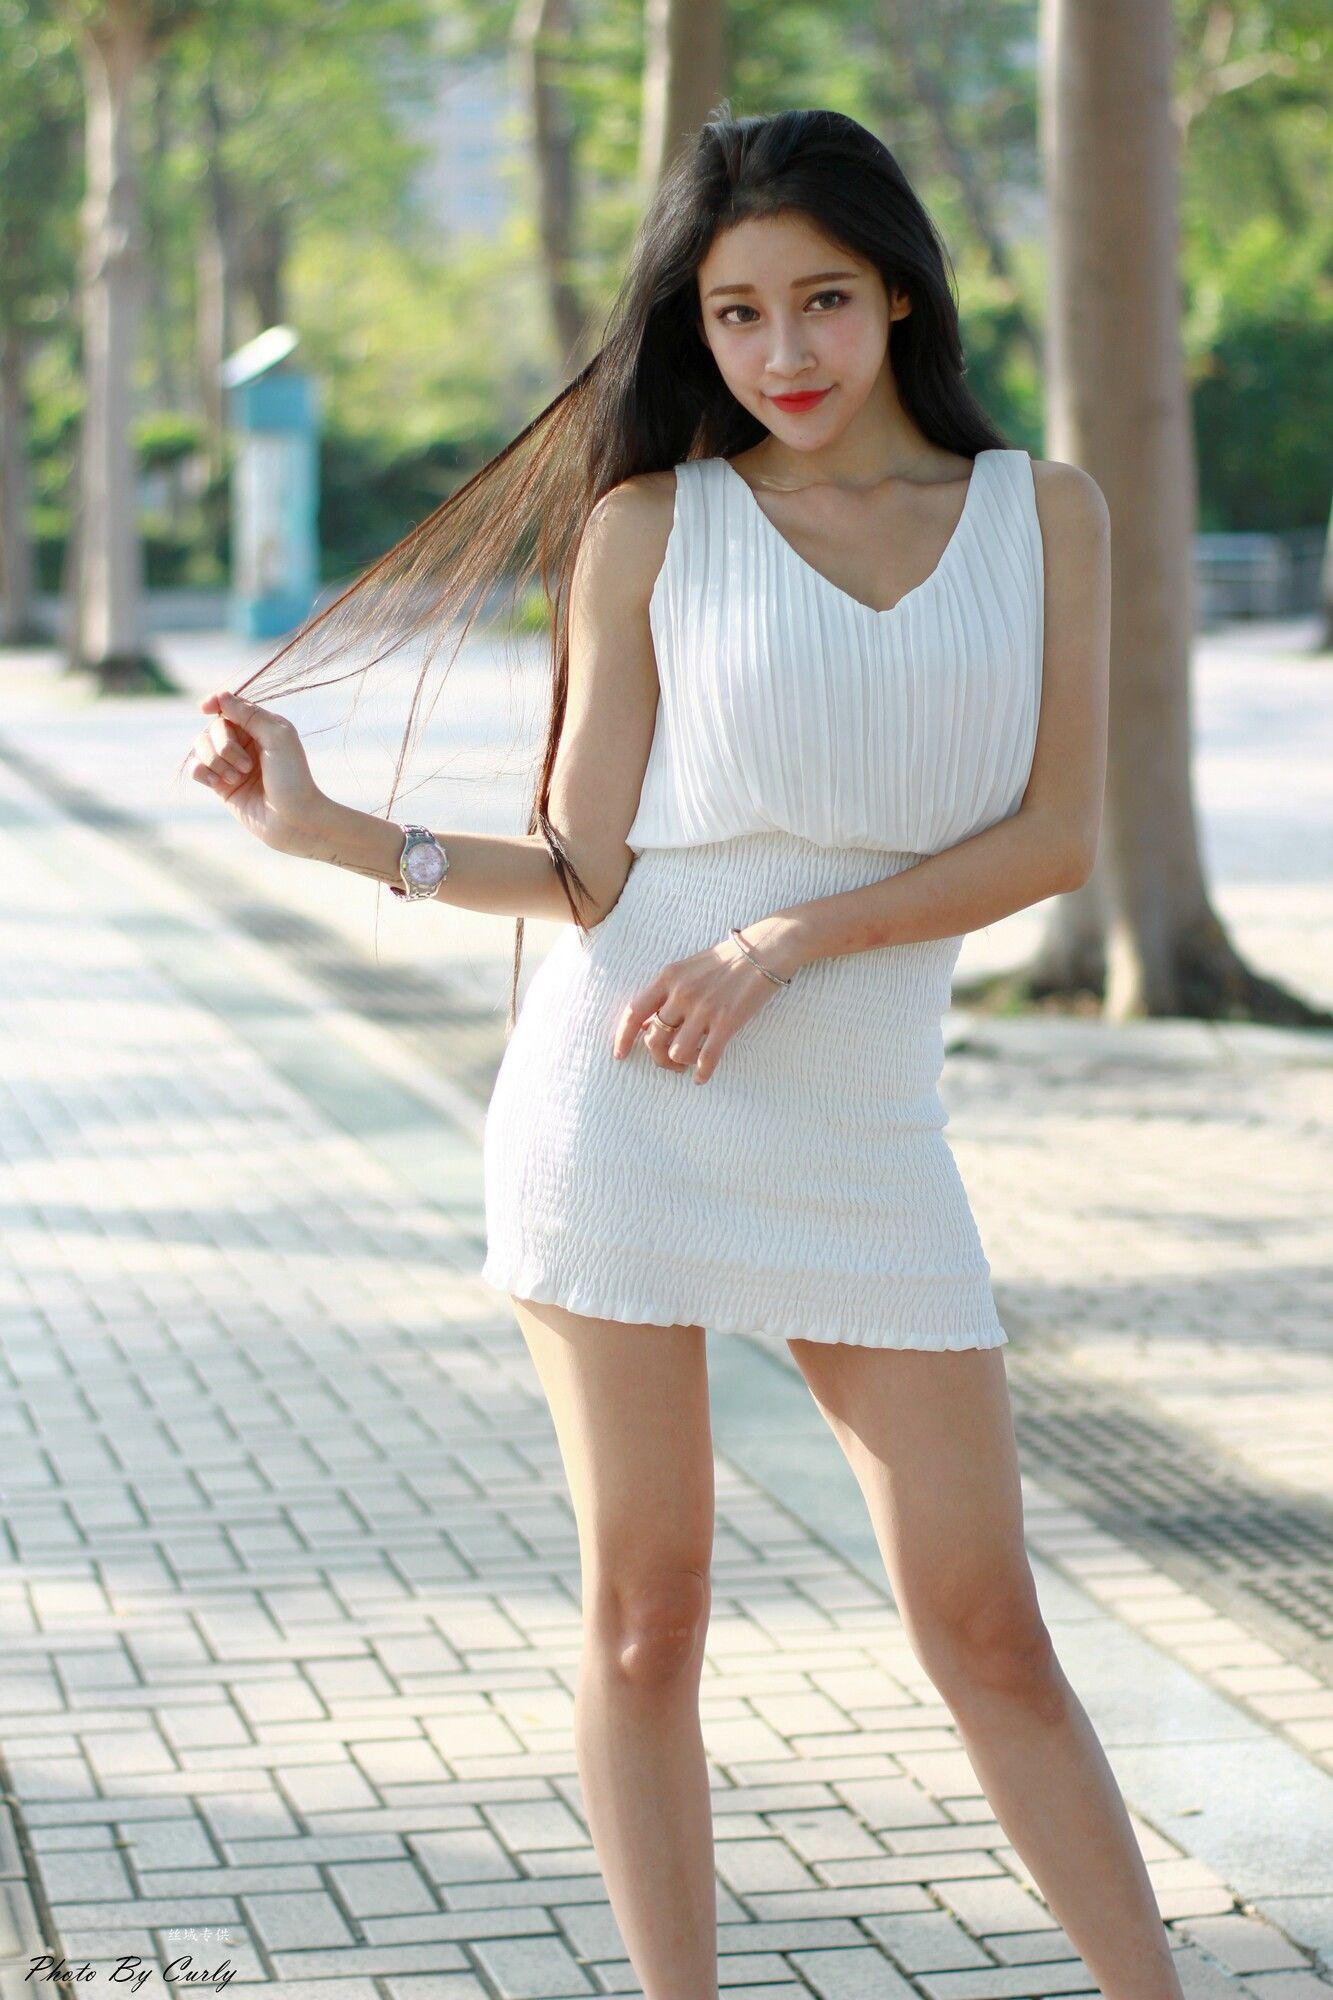 VOL.996 [台湾正妹]女神包臀裙美女长发美女街拍美腿街拍短裙:詹艾葳(腿模Avril,腿模Arvil)超高清个人性感漂亮大图(67P)